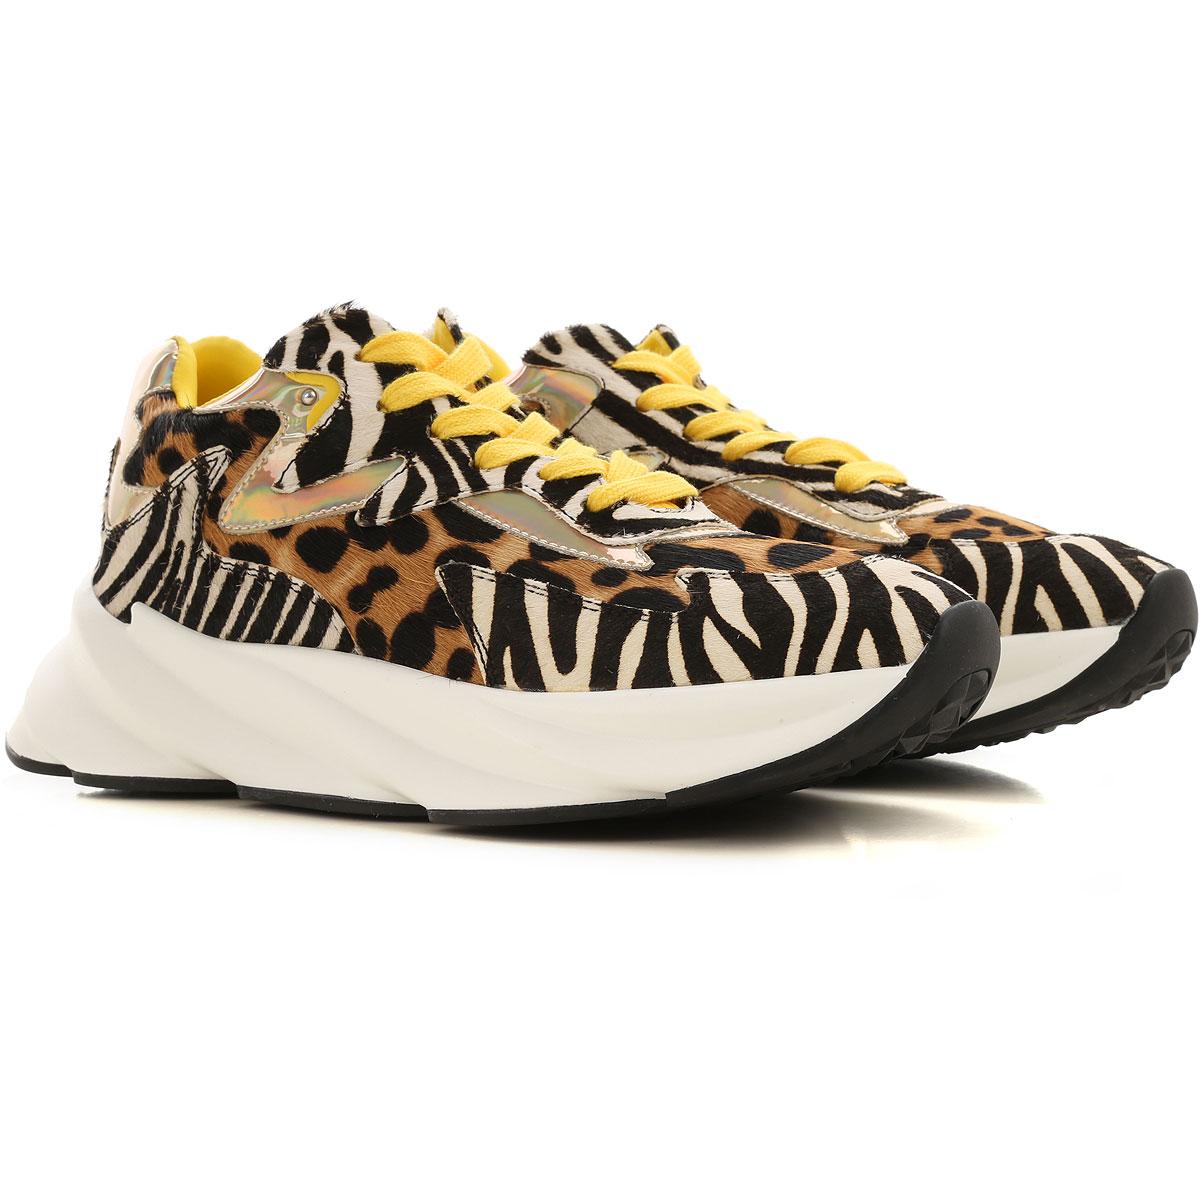 Elena Iachi Sneakers for Women On Sale, Zebra-Striped, Leather, 2019, 10 8 9